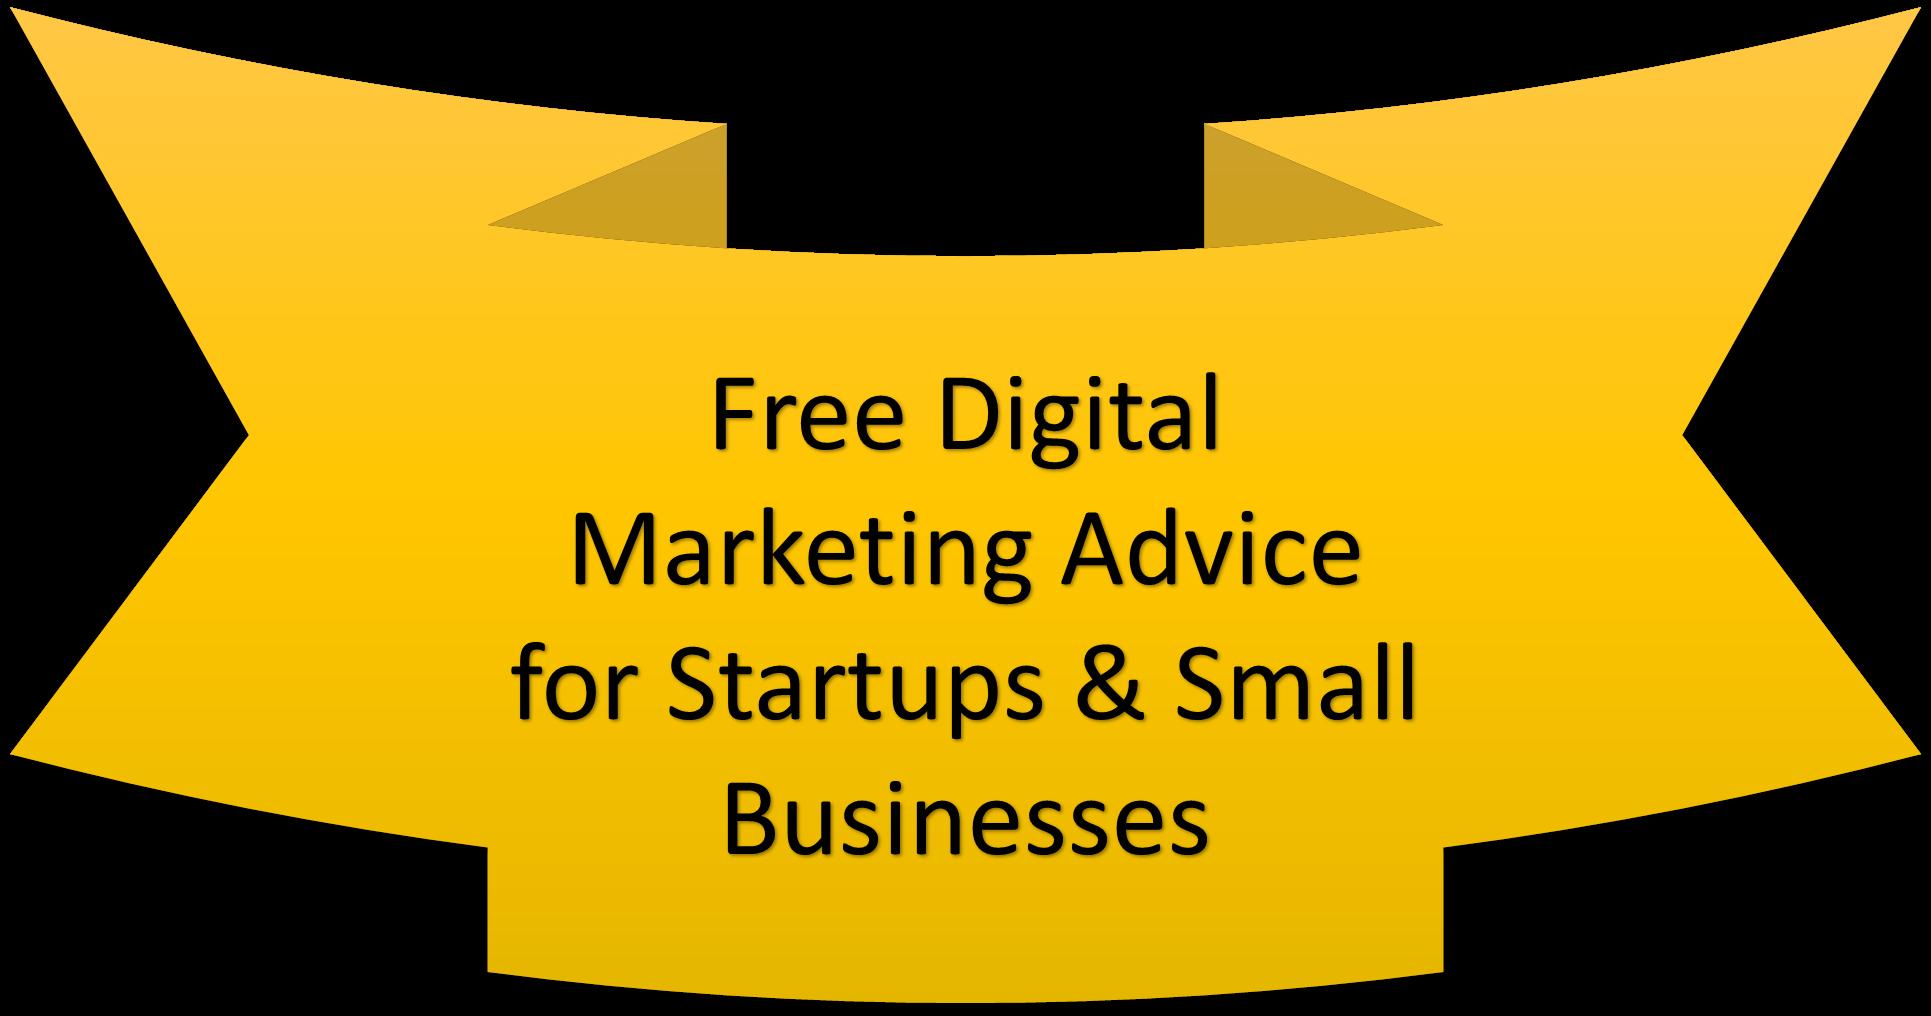 free digital marketing advice